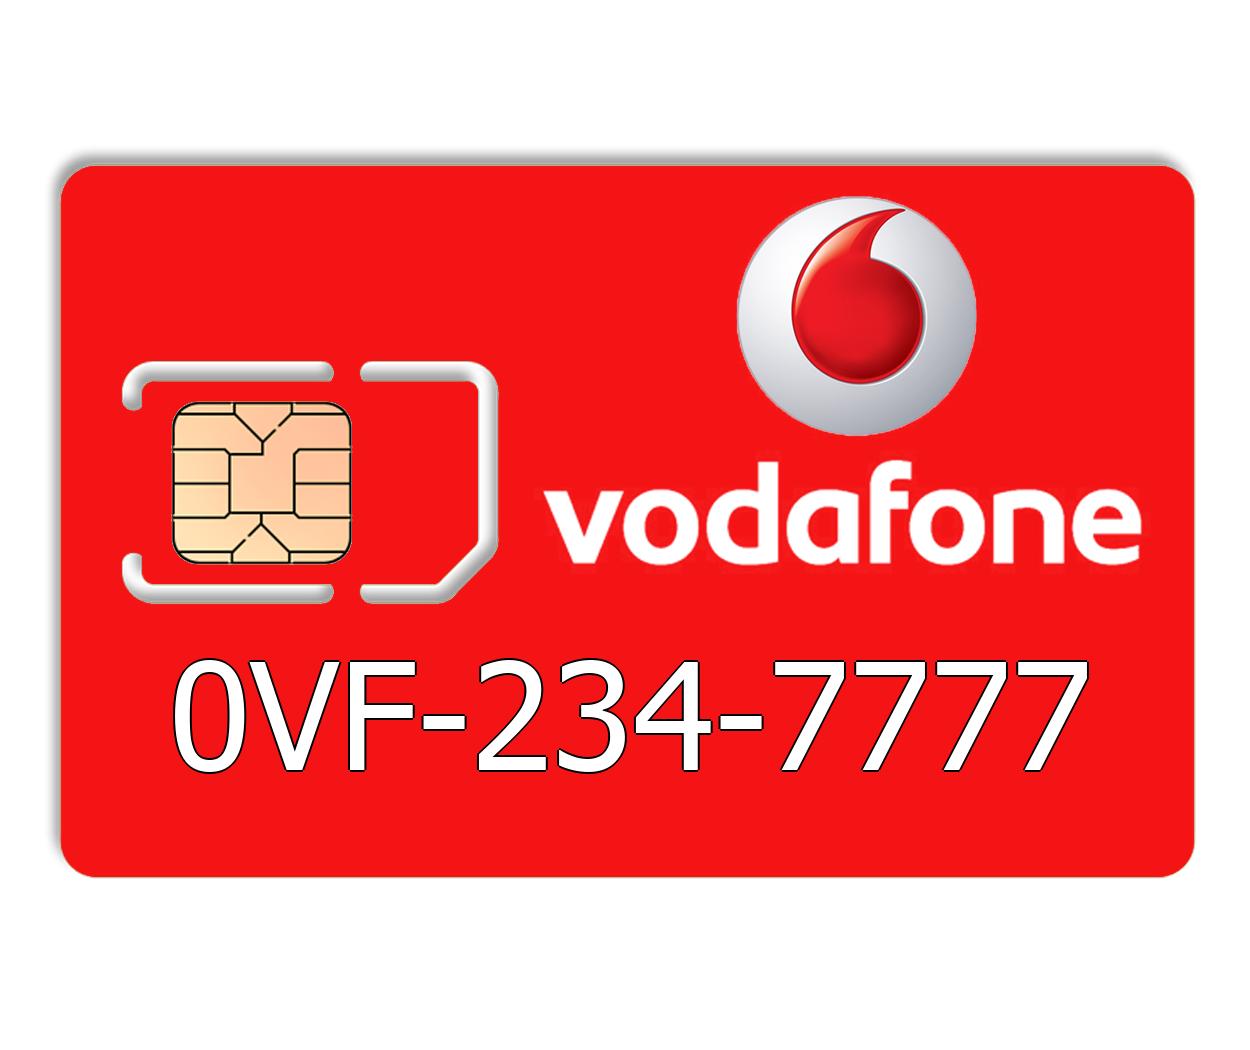 Красивый номер Vodafone 0VF-234-7777